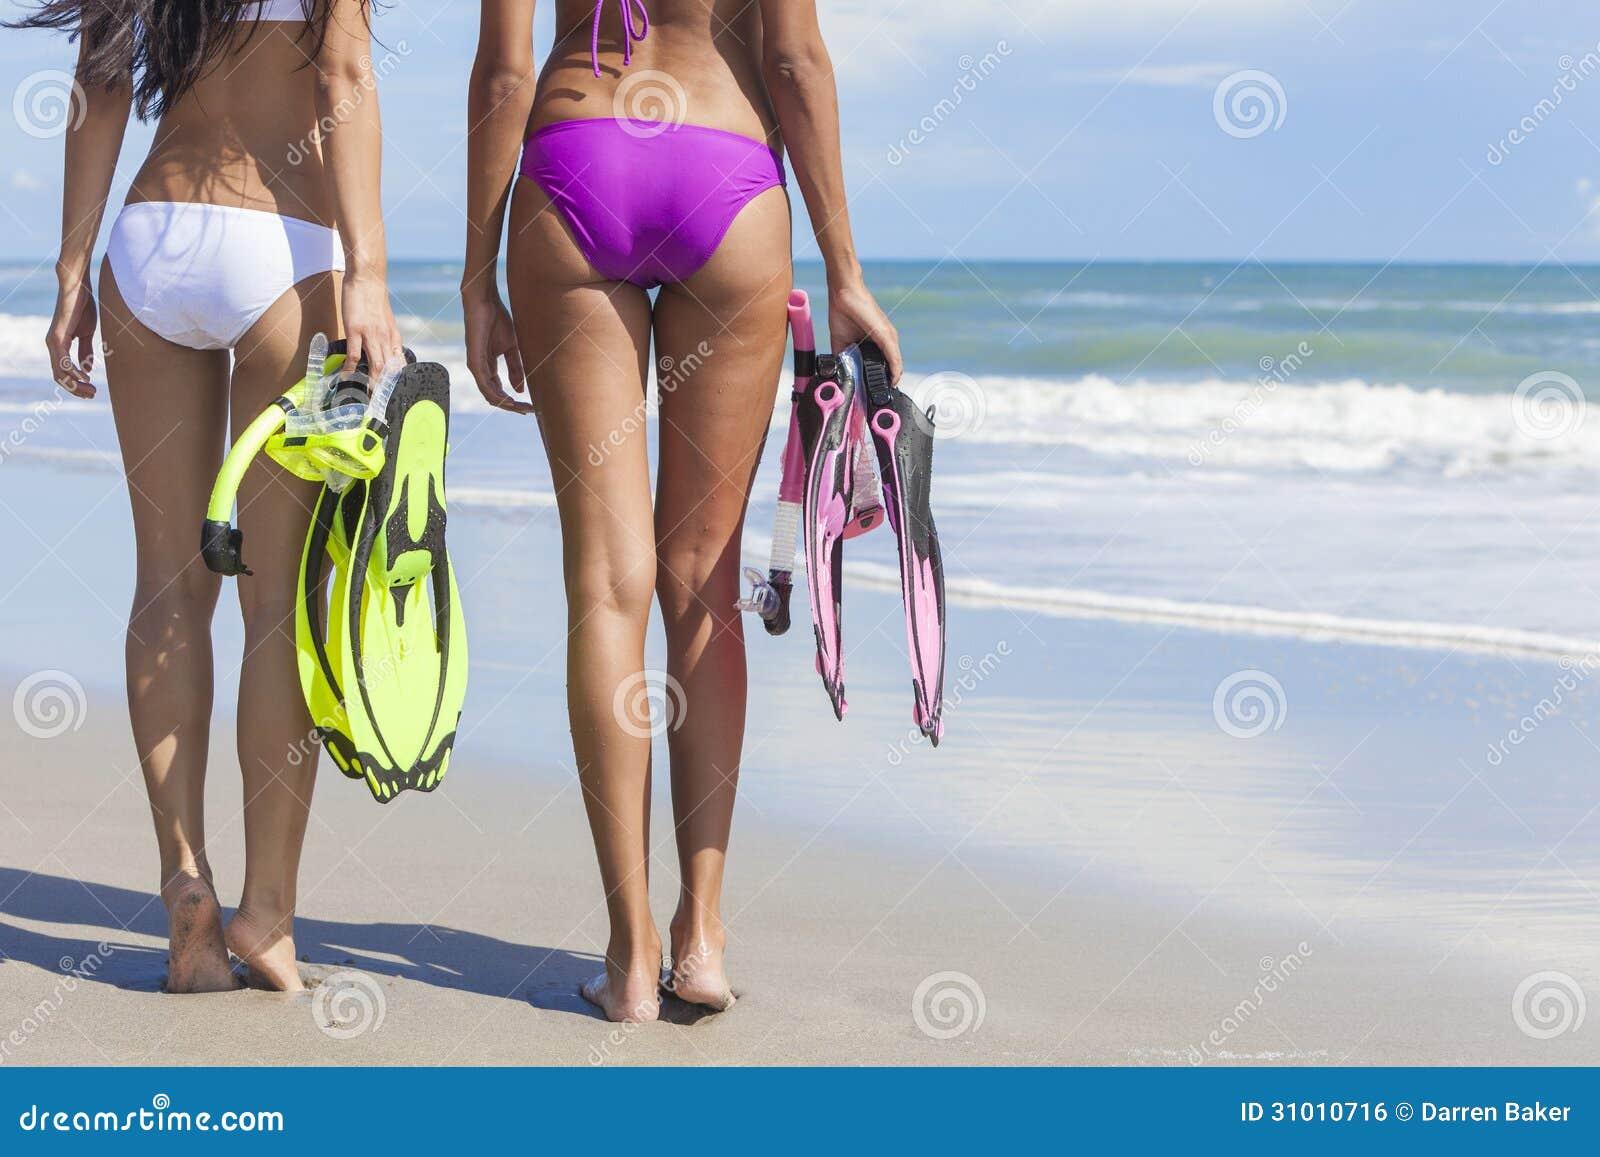 Красивое фото девушки на пляже вид сзади — 7